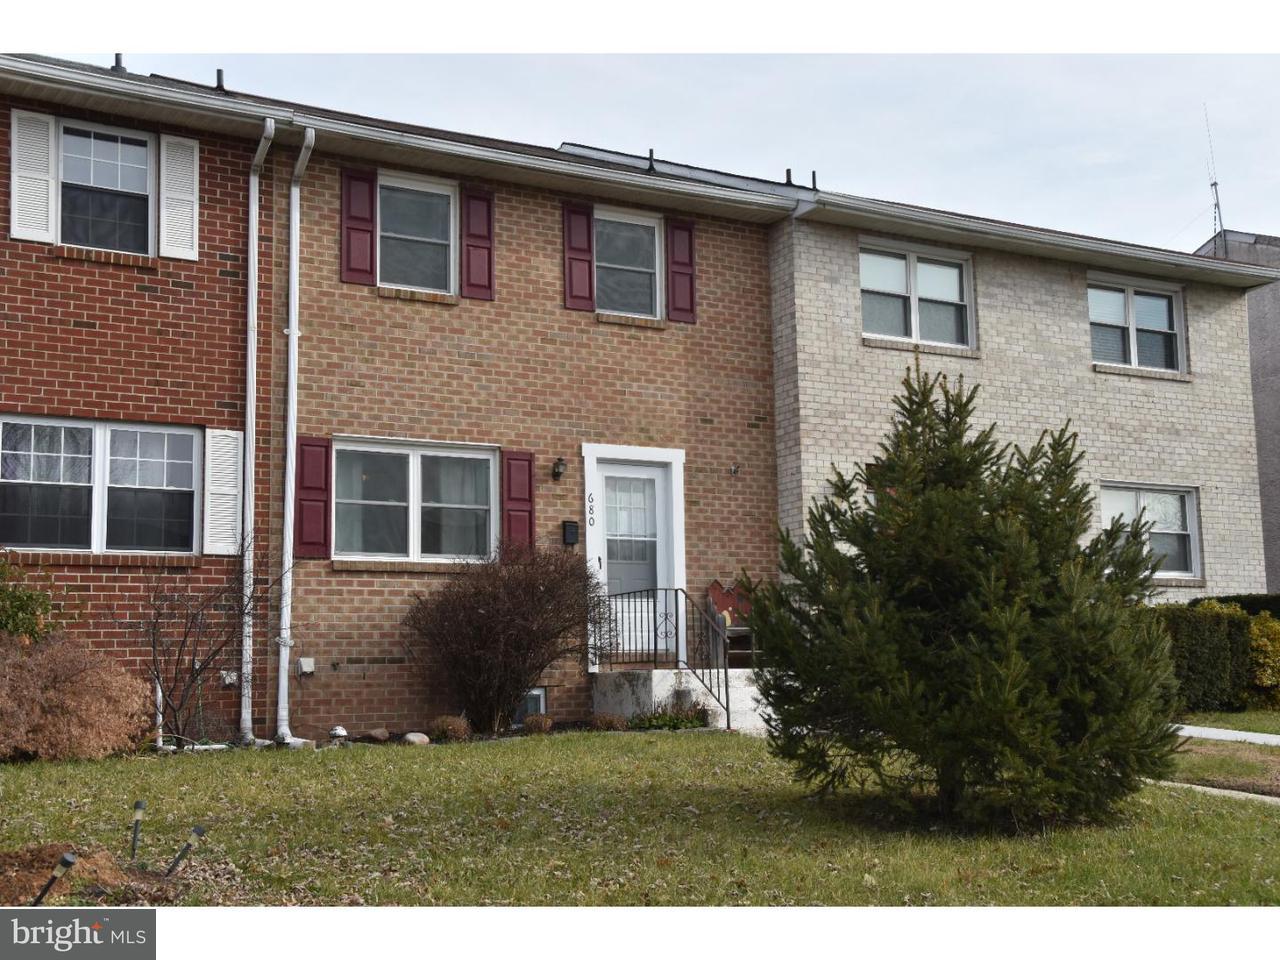 Casa unifamiliar adosada (Townhouse) por un Venta en 680 JEFFERSON Street Red Hill, Pennsylvania 18076 Estados Unidos